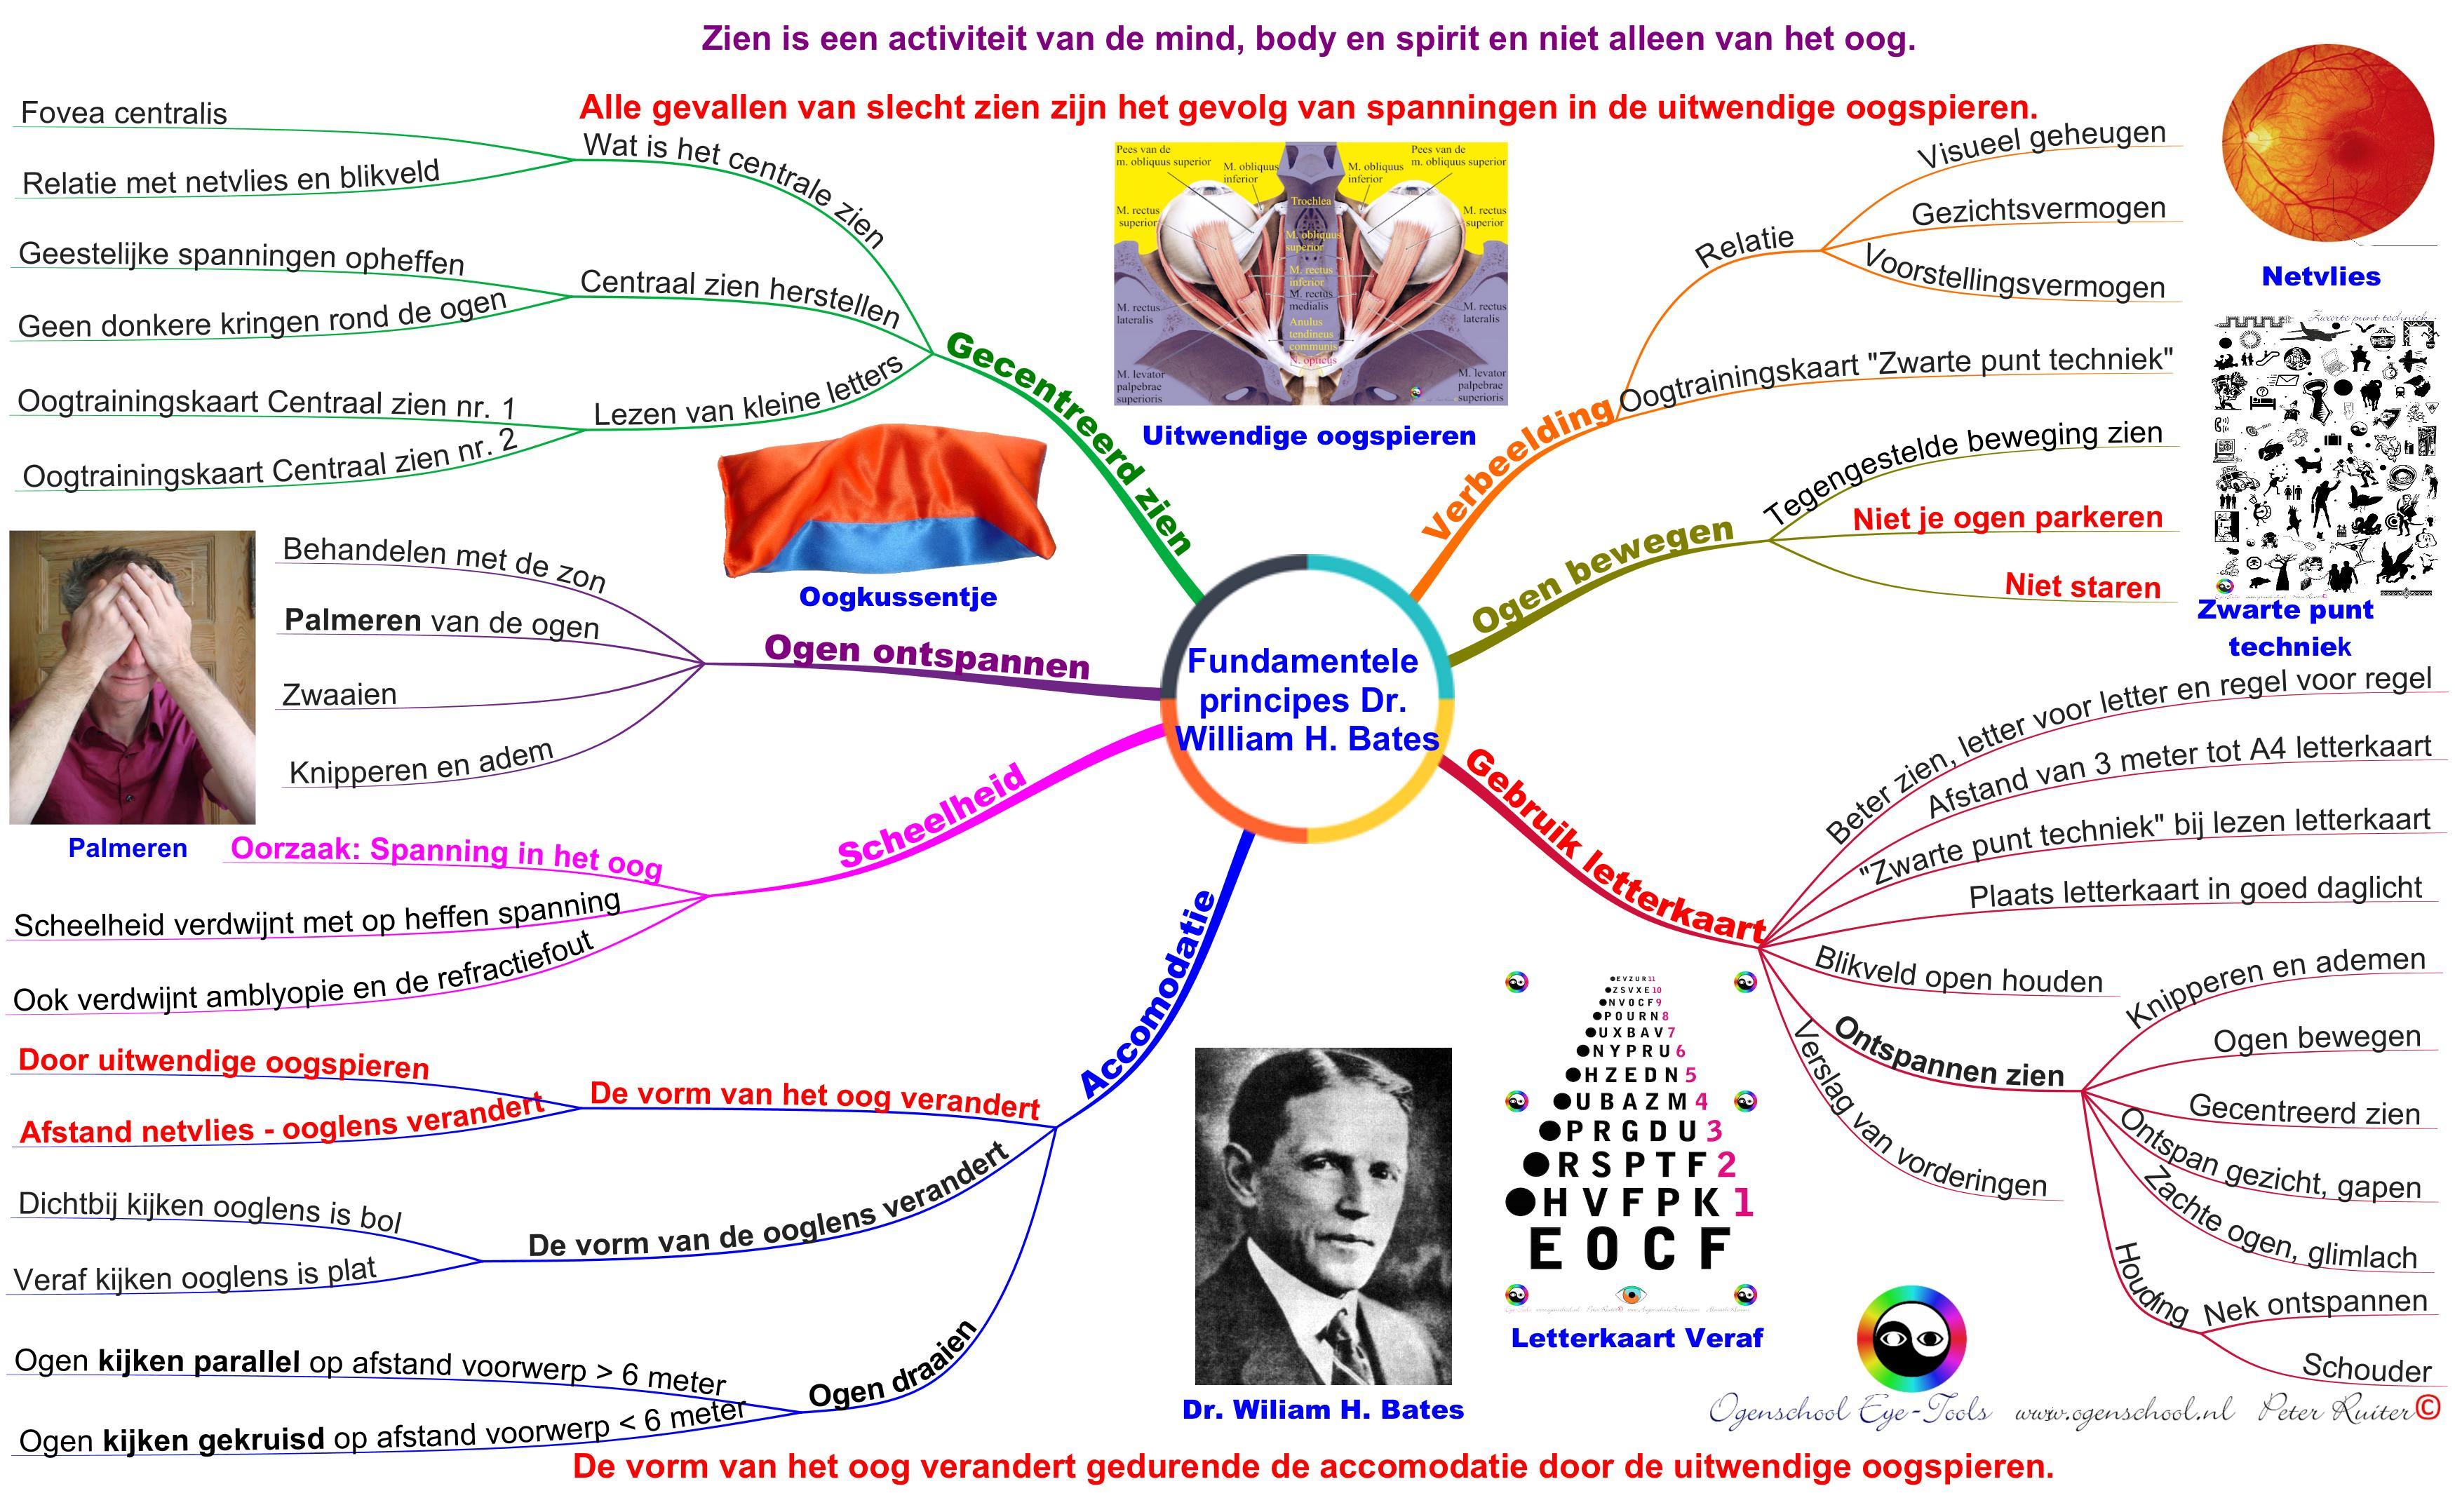 fundamentele-principes-dr-william-h-bates